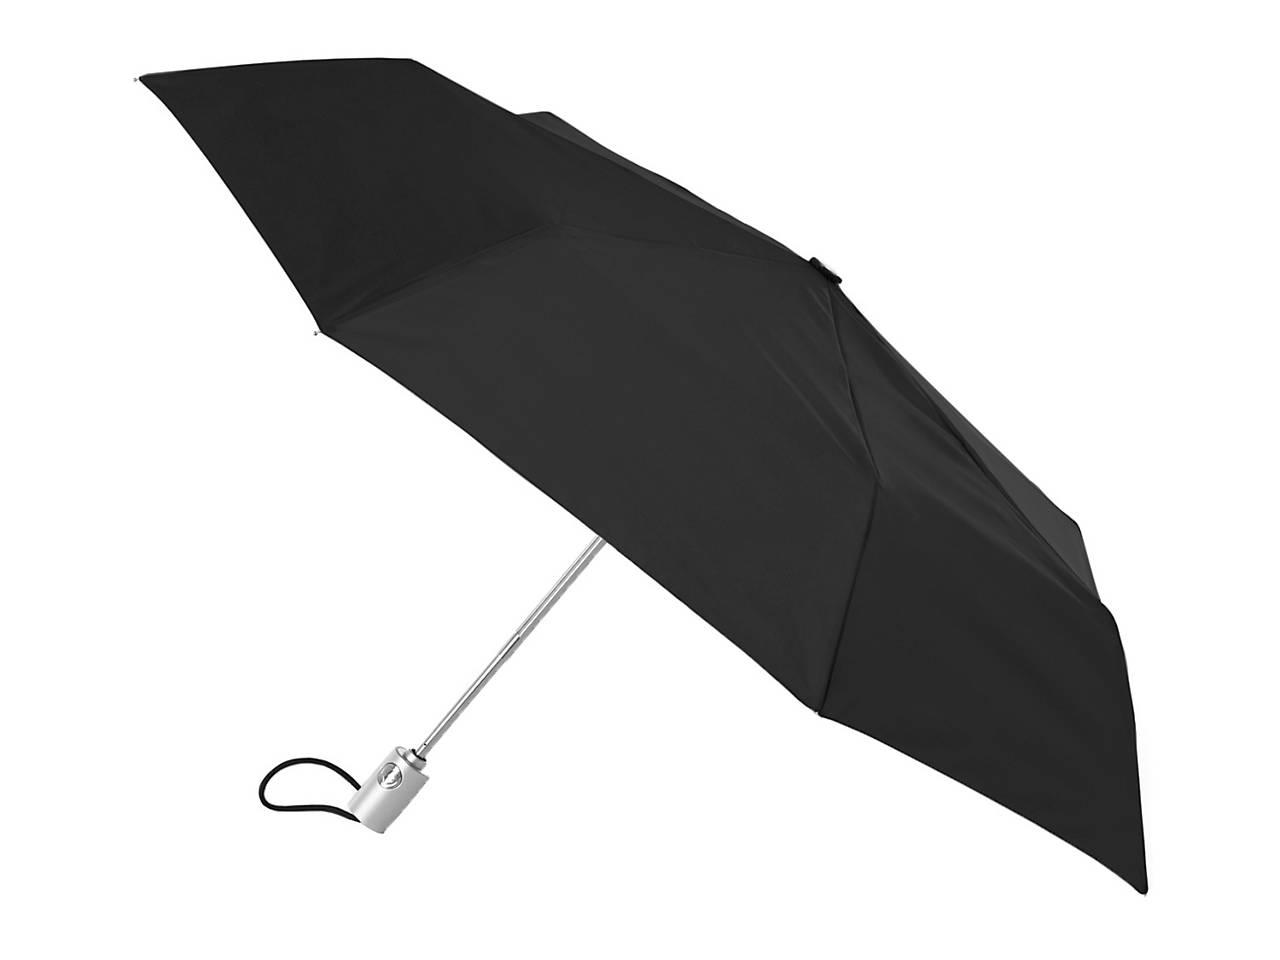 Seminude women with unbrella — img 15